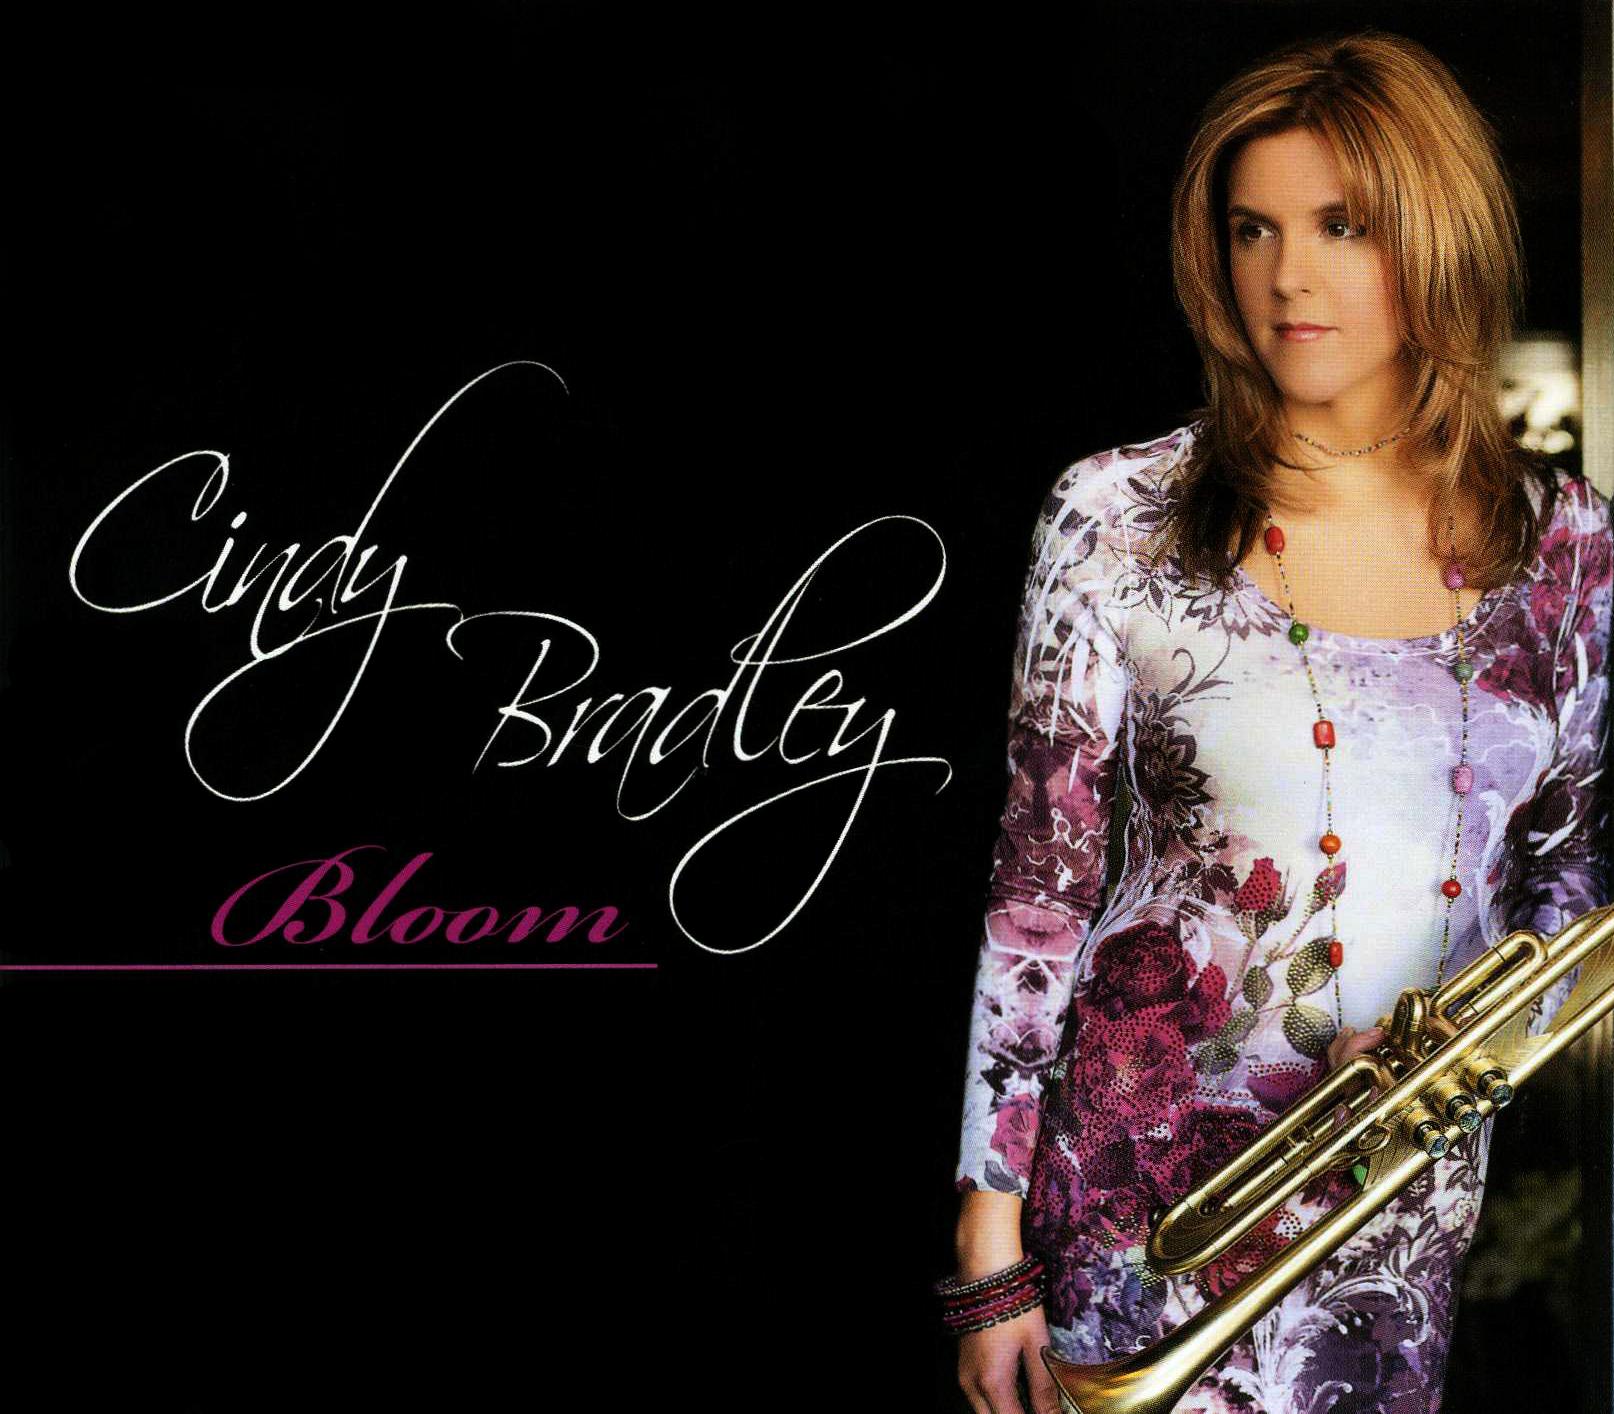 Album Bloom 2009 – Cindy Bradley